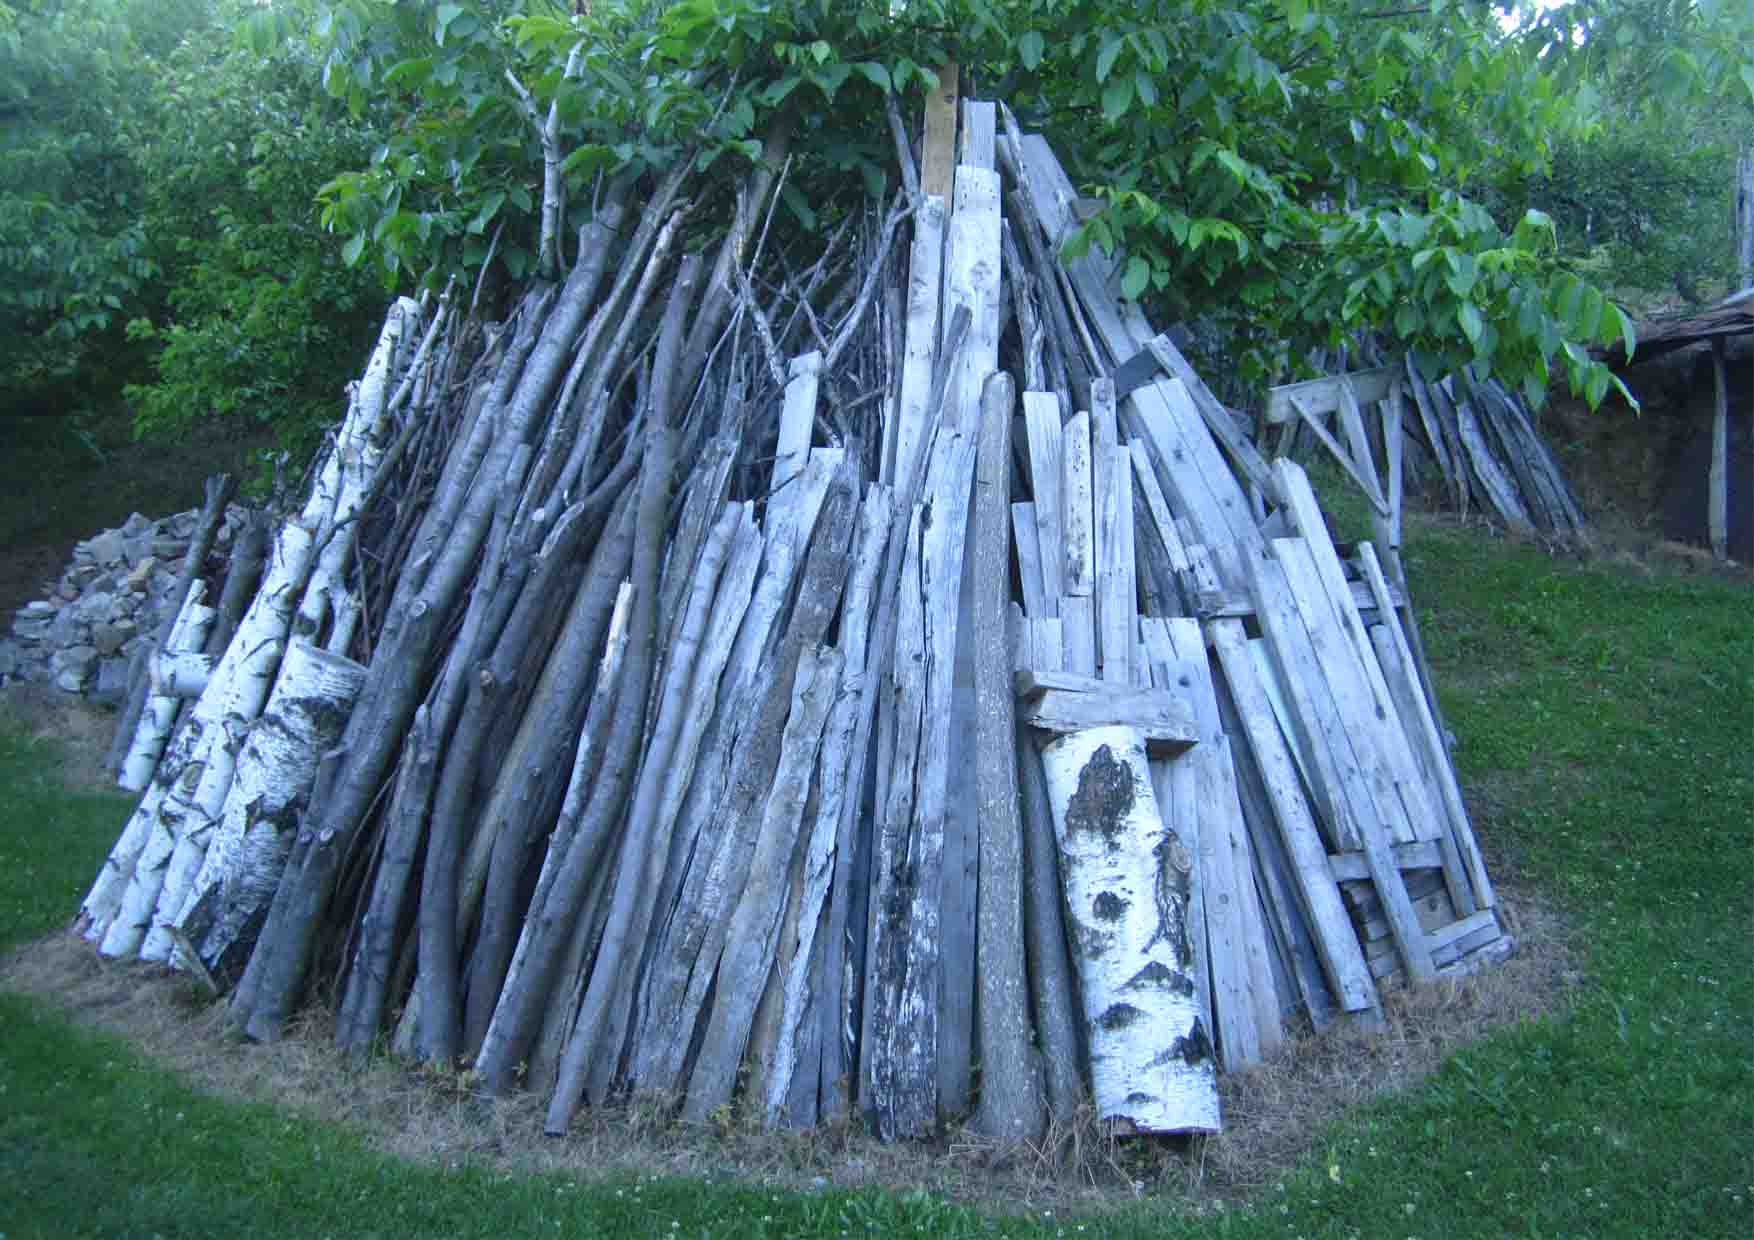 25 Draca radionica jun 2015 Dan2 slaganje drveta